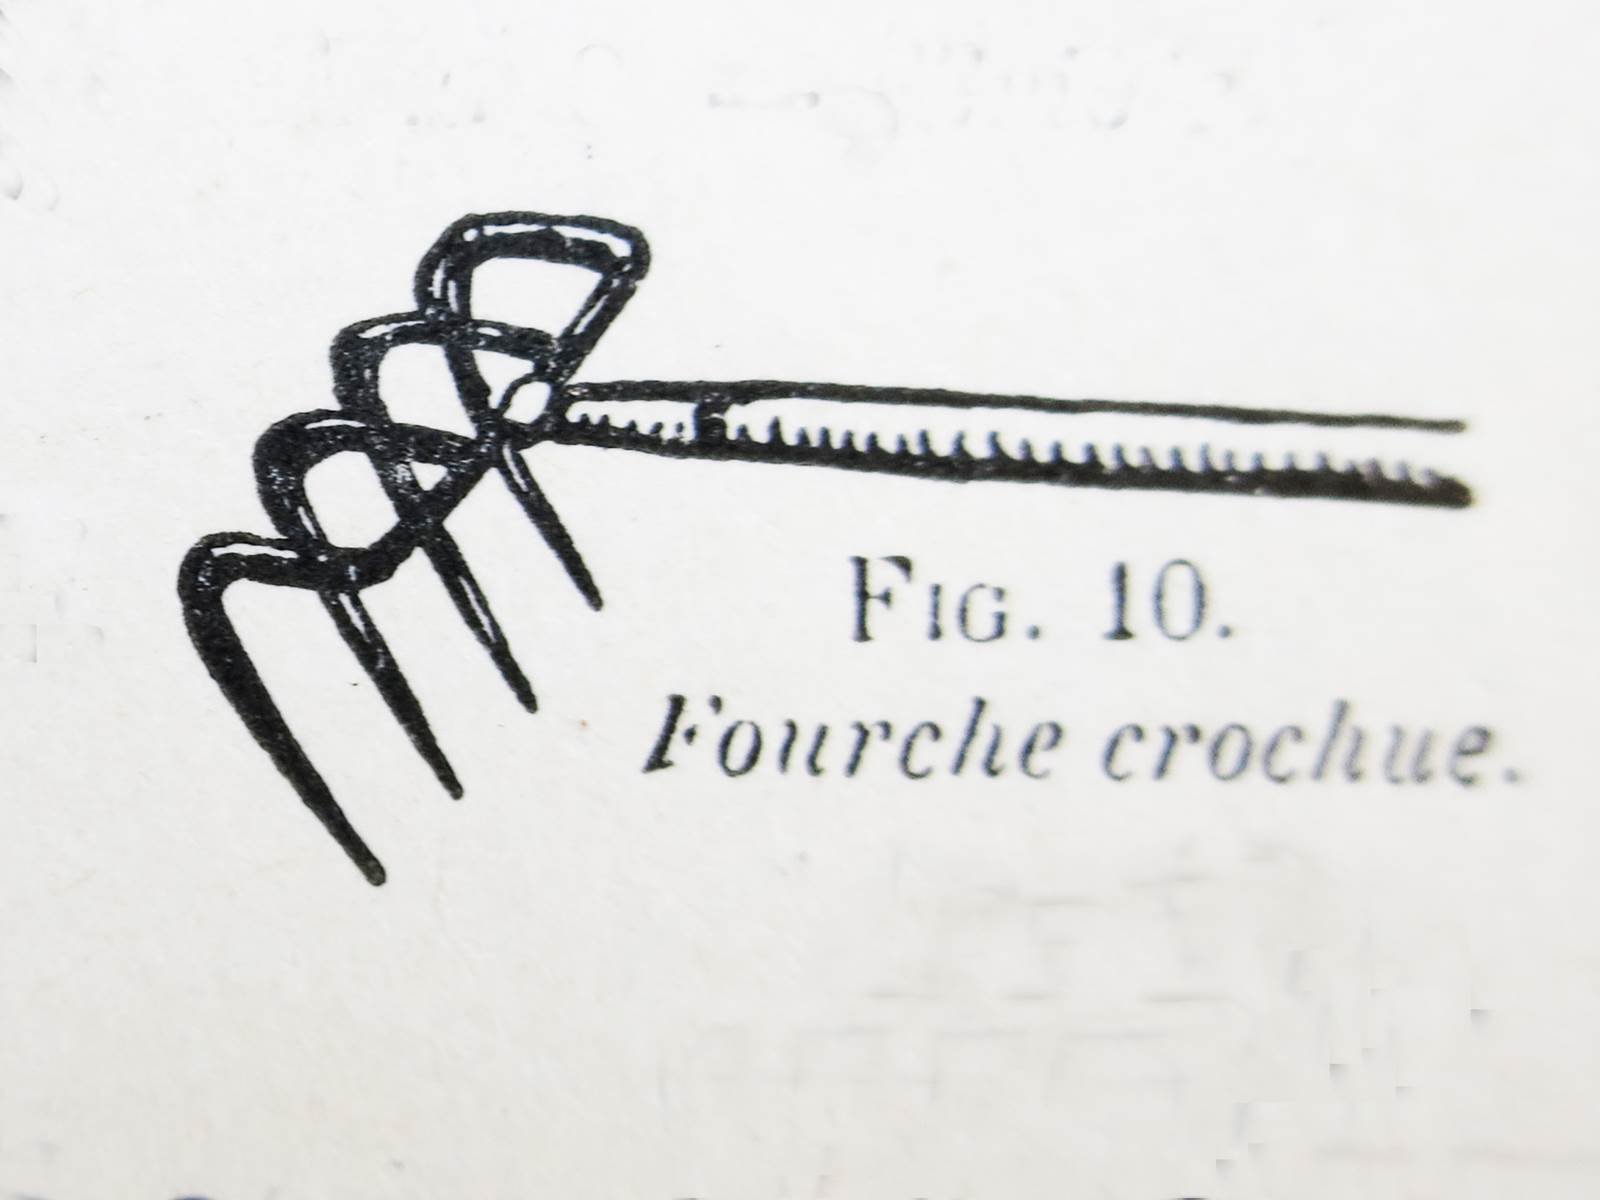 Fourche crochue